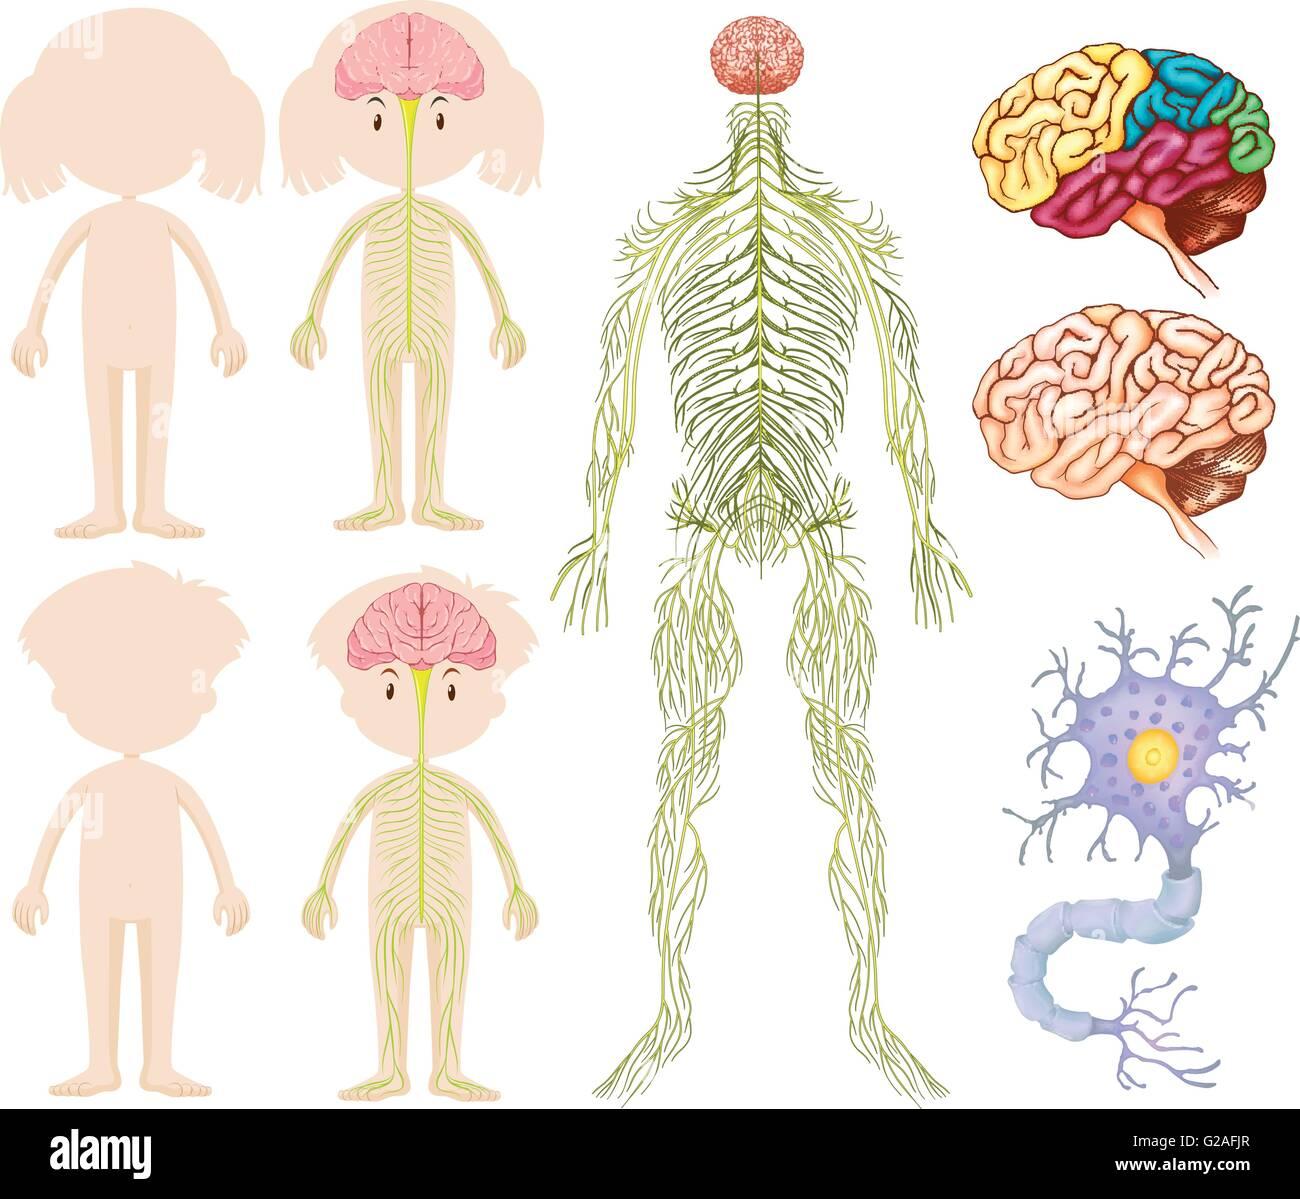 Anatomy Of Little Boy And Girl Illustration Stock Vector Art